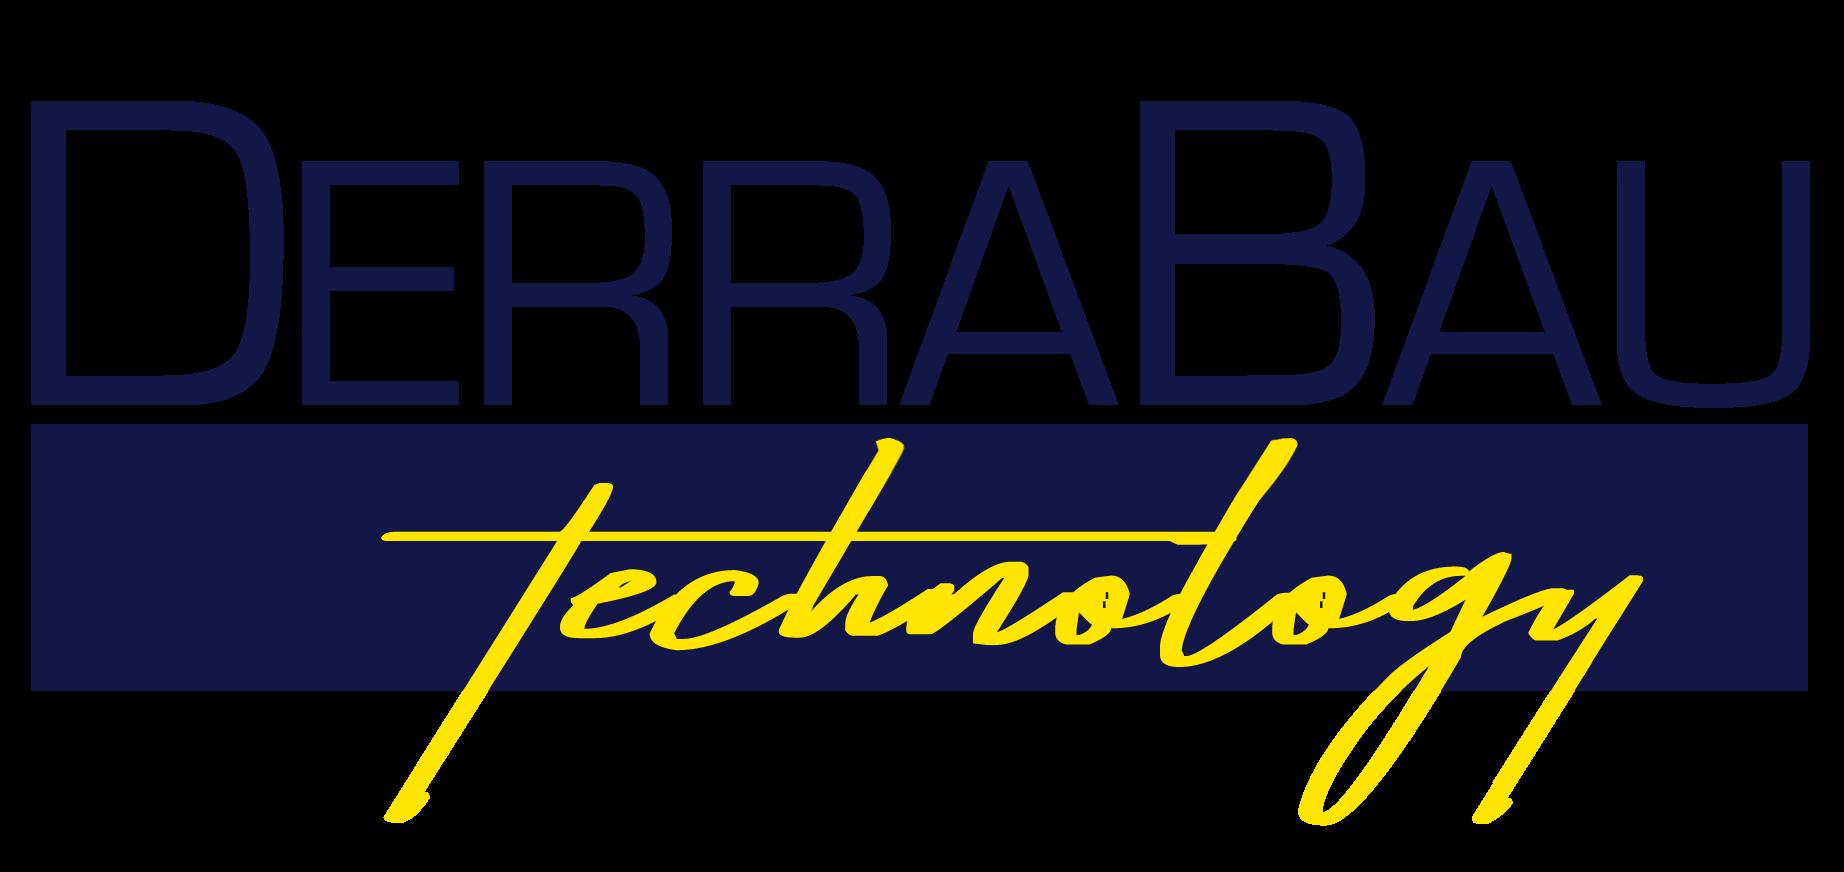 Derra Bau technology